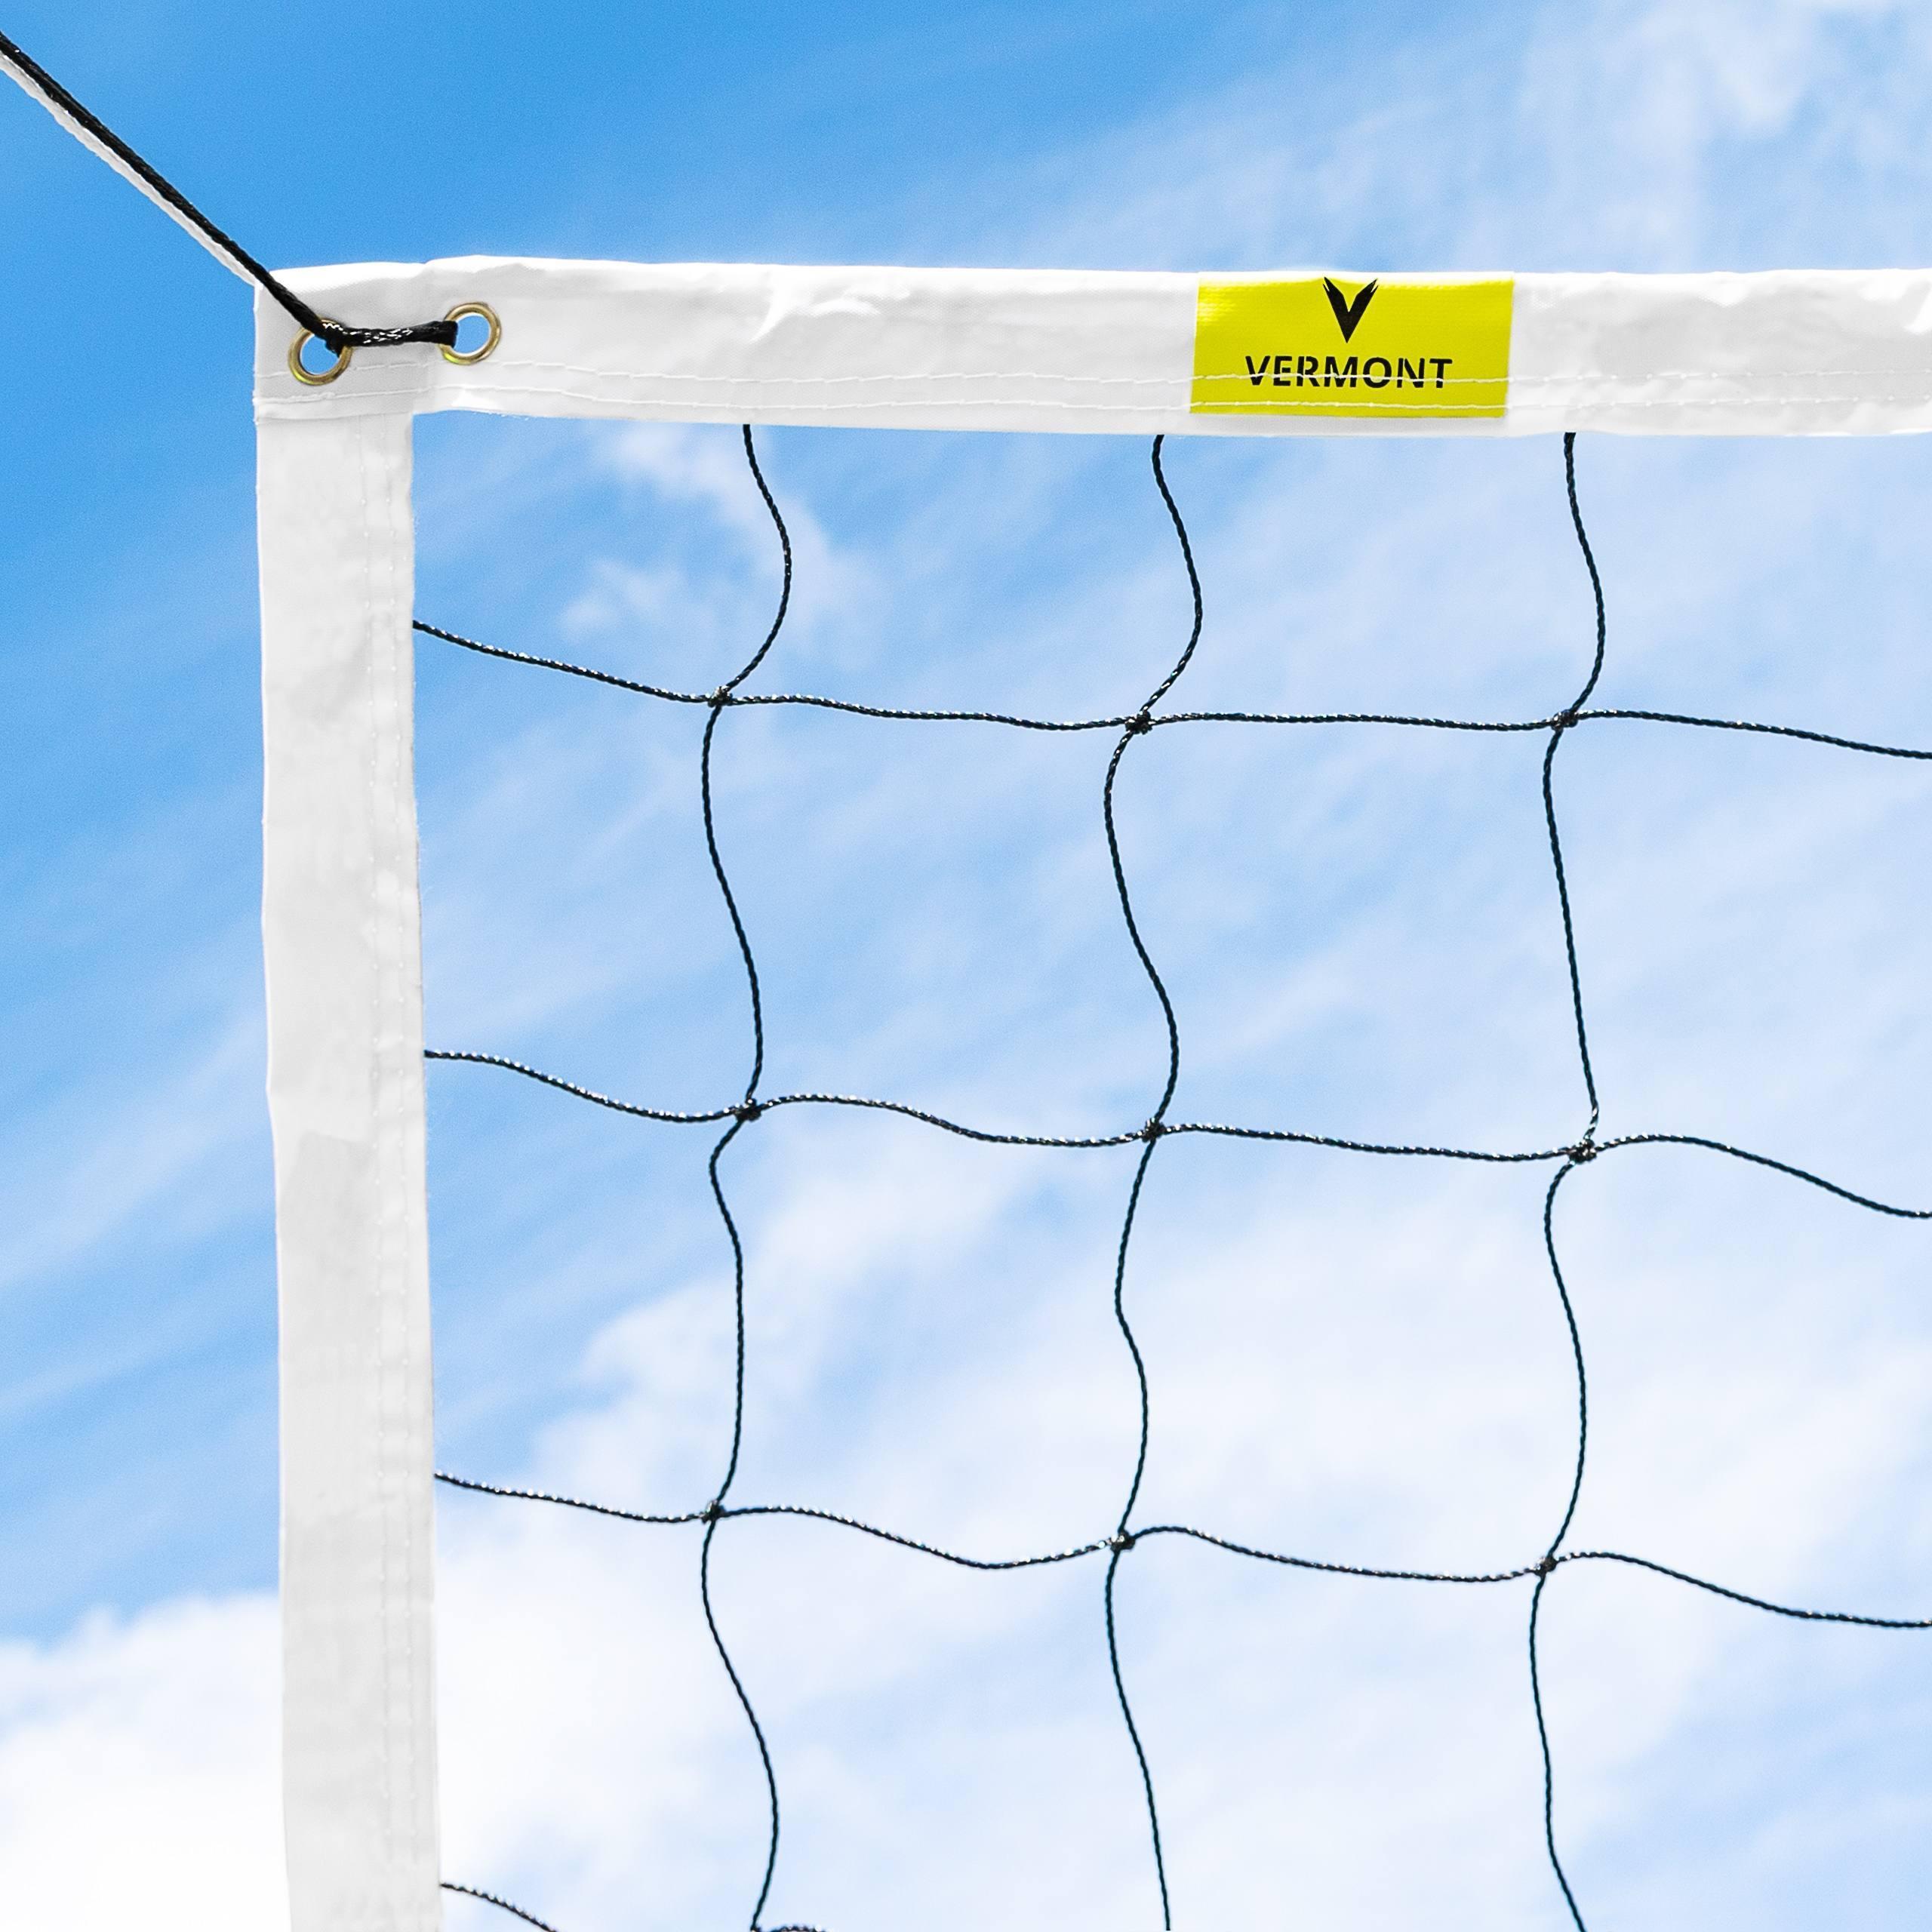 Regulation Volleyball Net Cord Headline Net World Sports